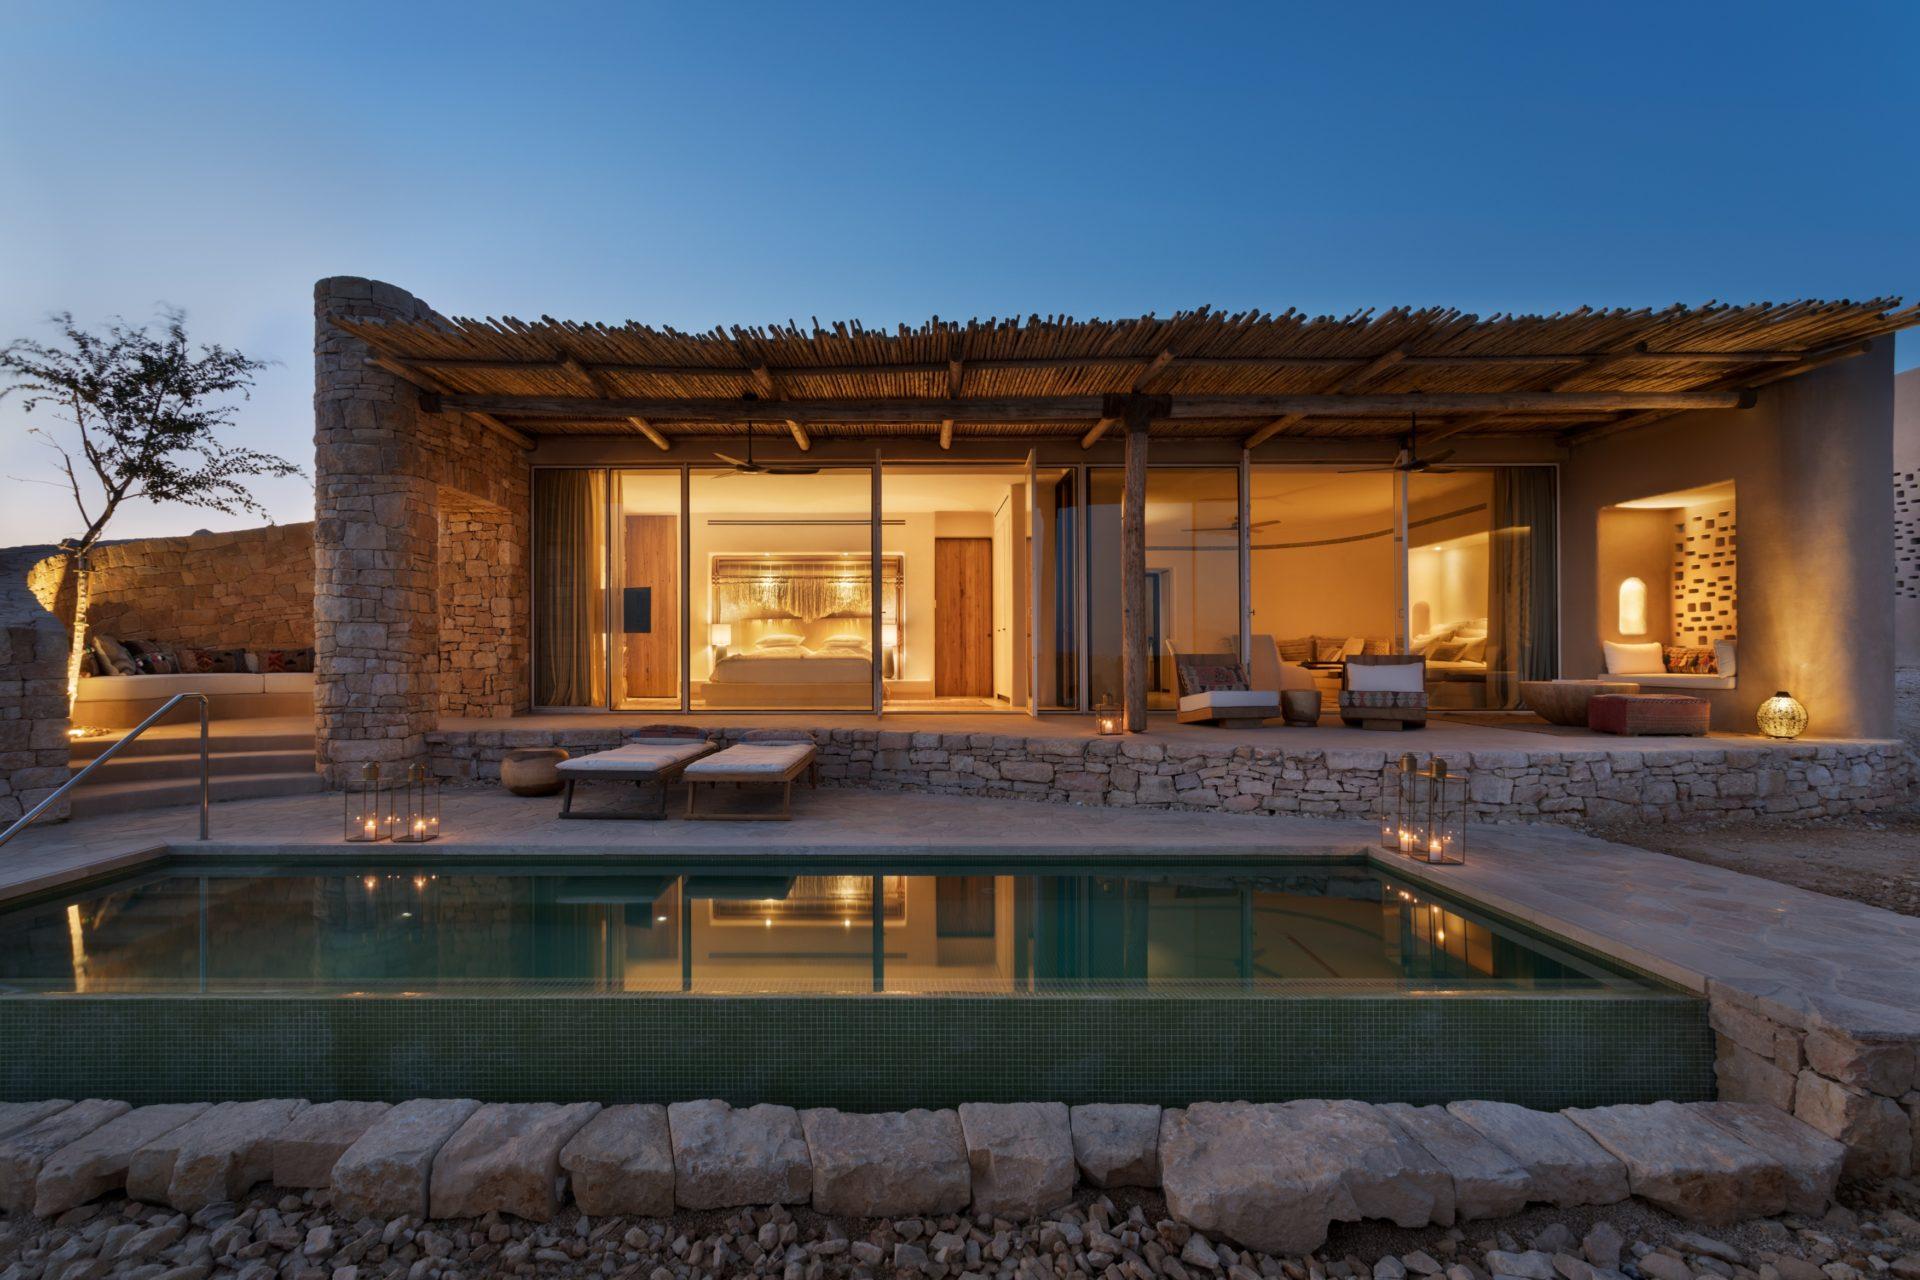 Six Senses Shaharut – Panorama Pool Villa – sunset – photo credit Assaf Pinchuk